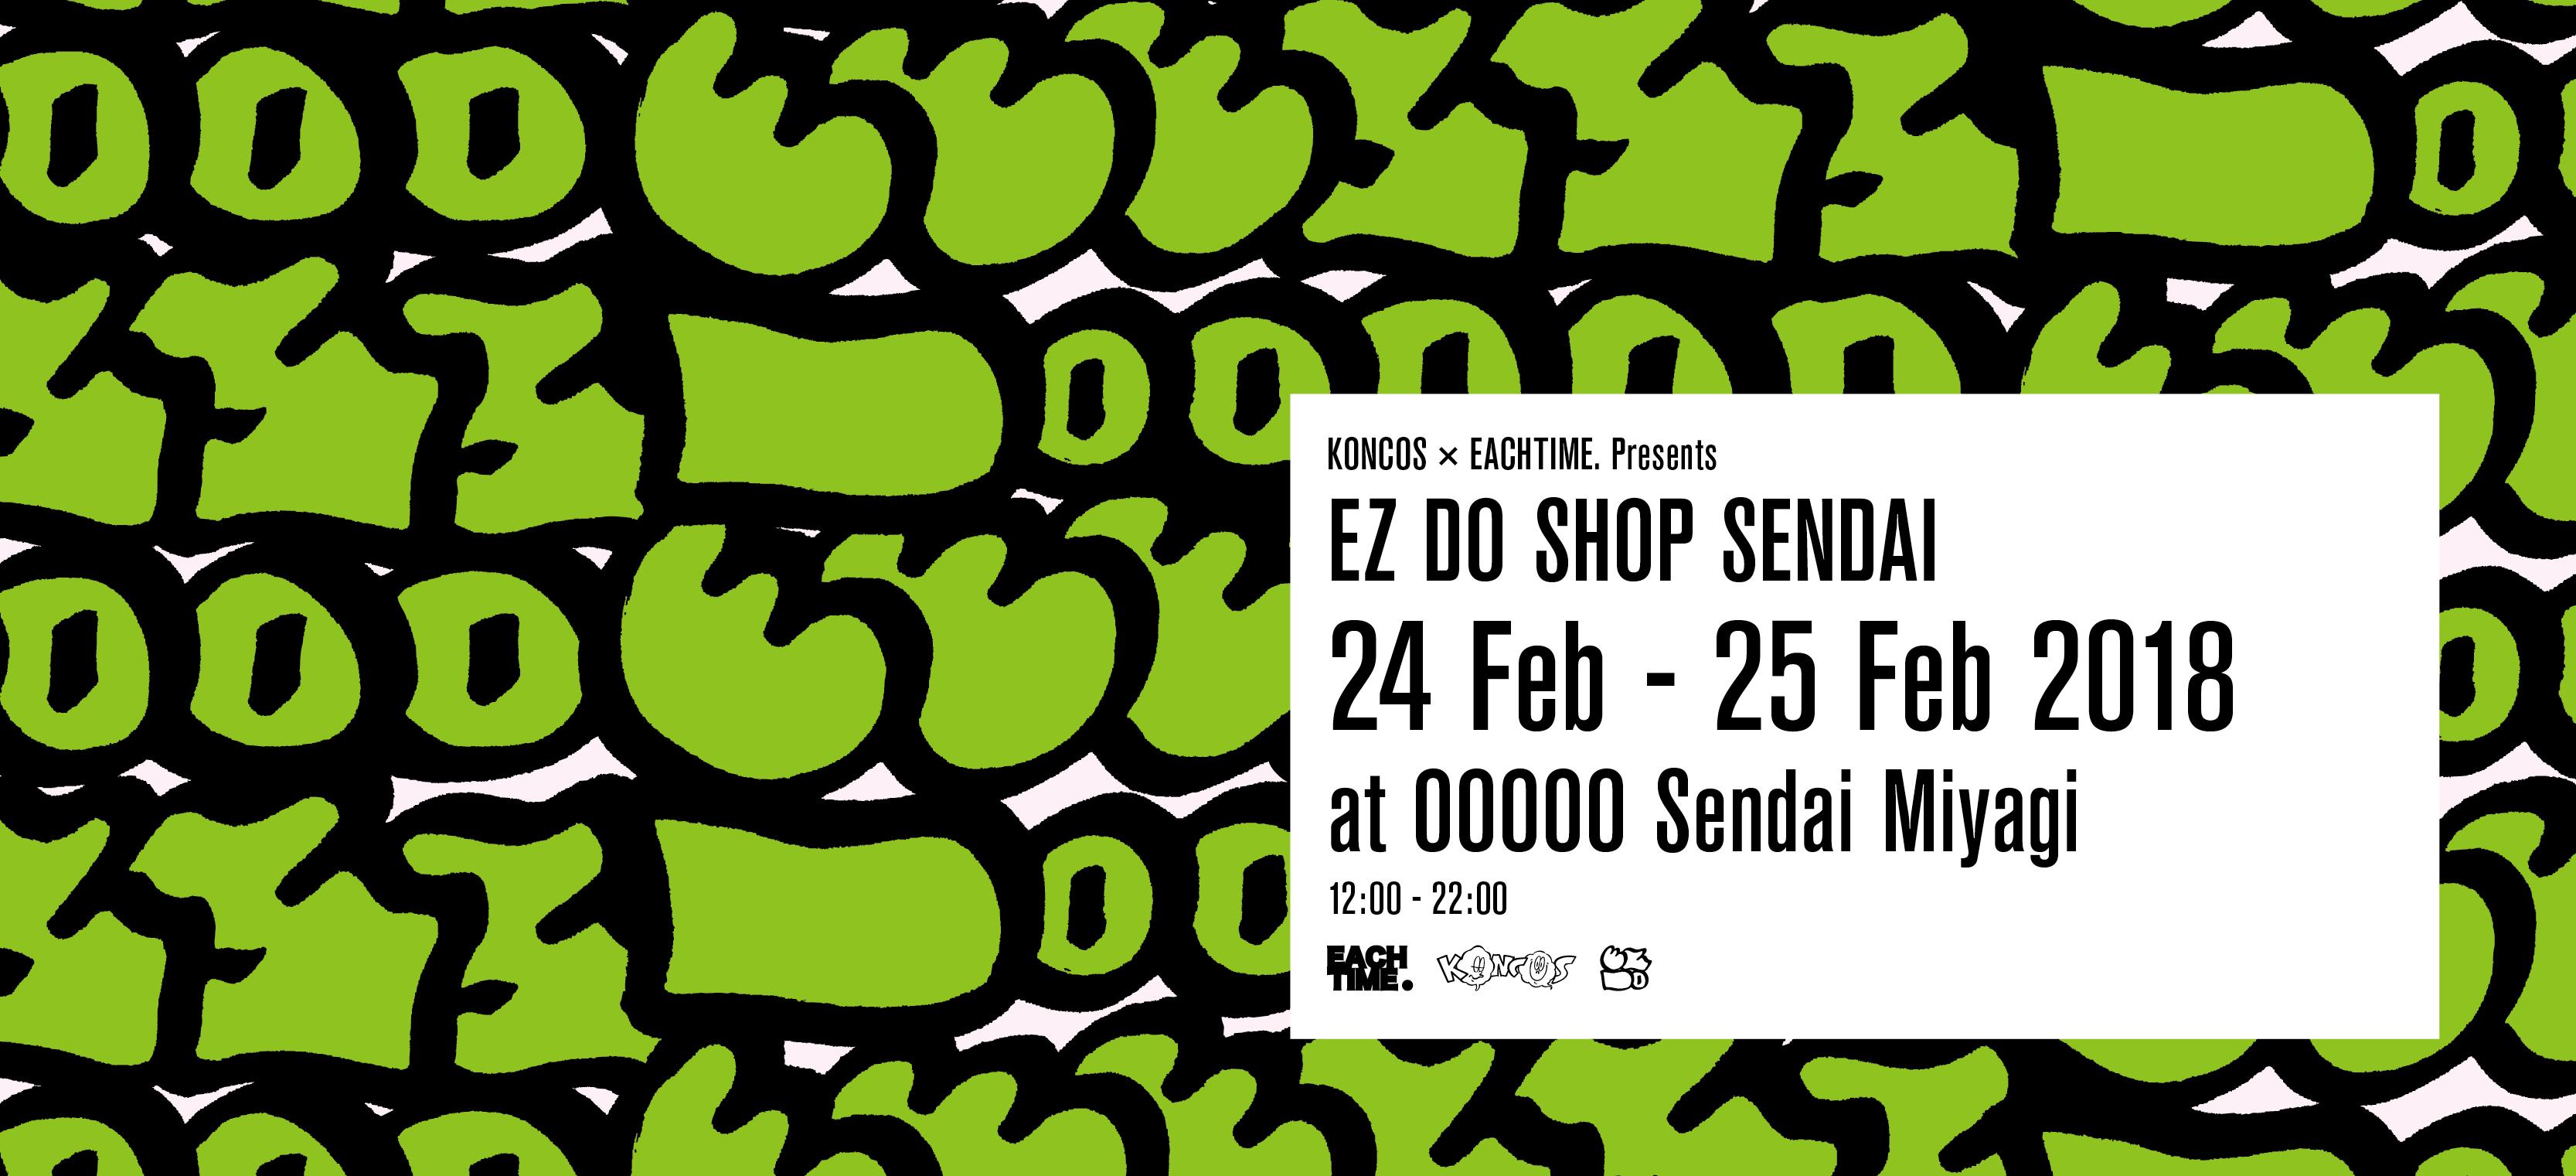 EZ DO SHOP 2018 SENDAI